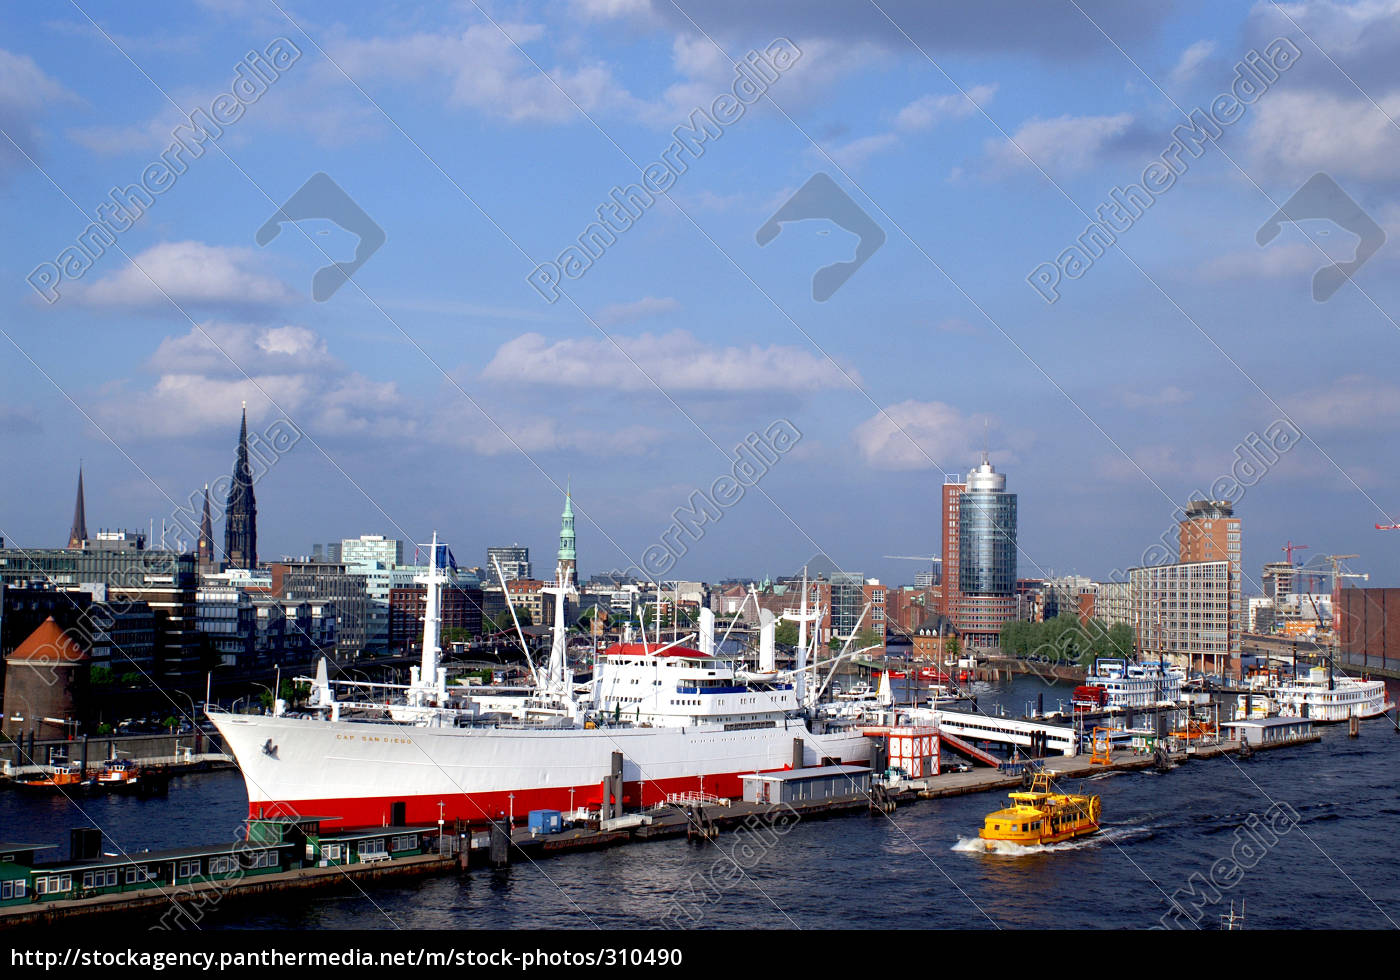 port, of, hamburg: - 310490